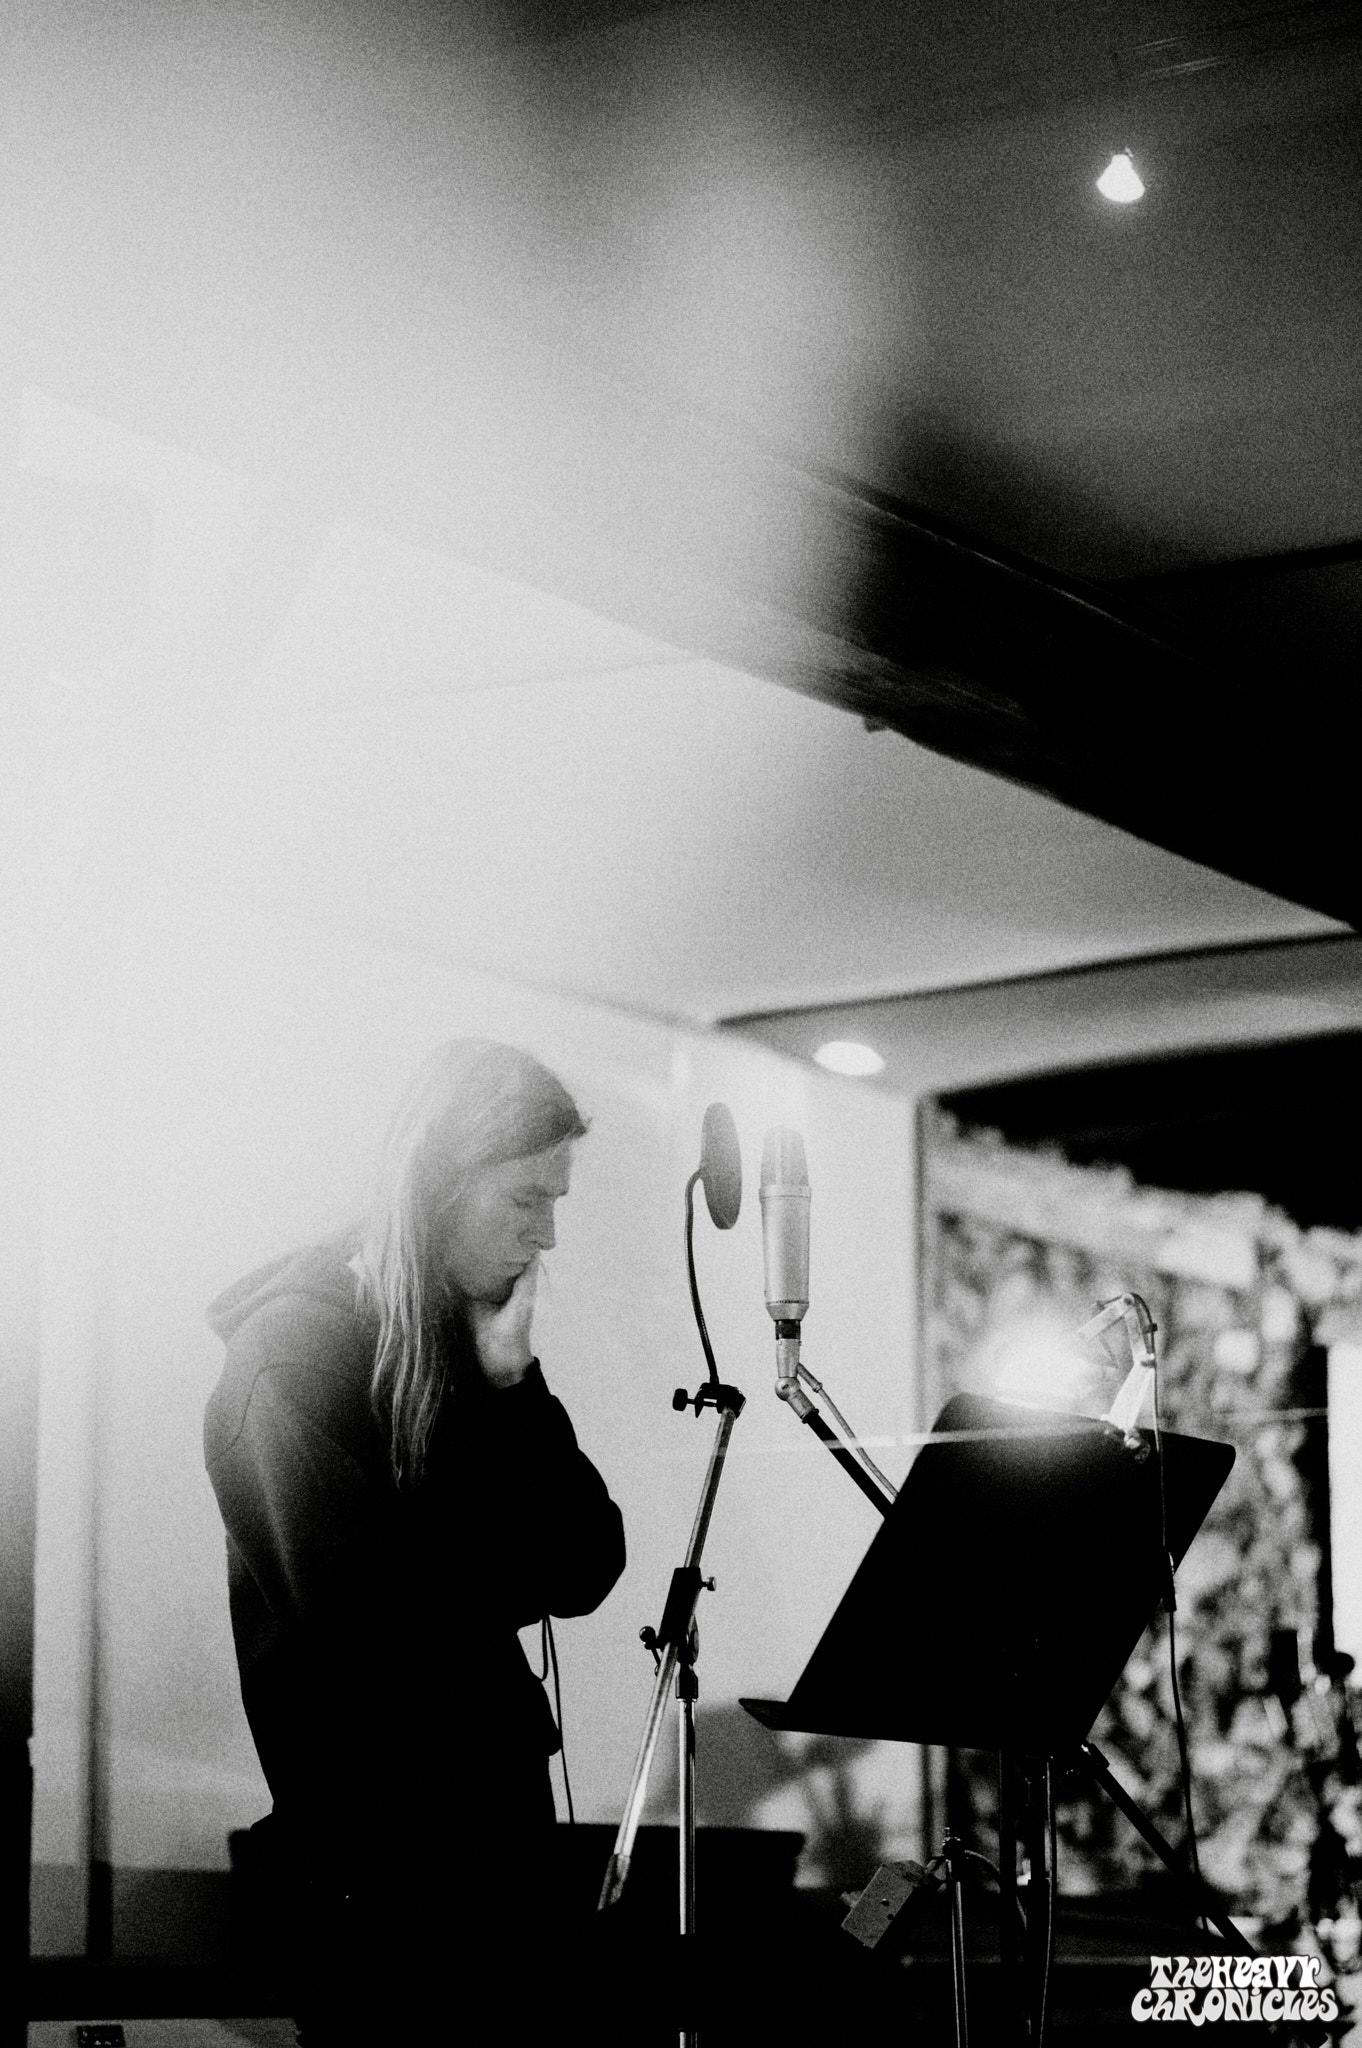 Elder-Studio-Black-Box-2019-Gael-Mathieu-The-Heavy-Chronicles-59